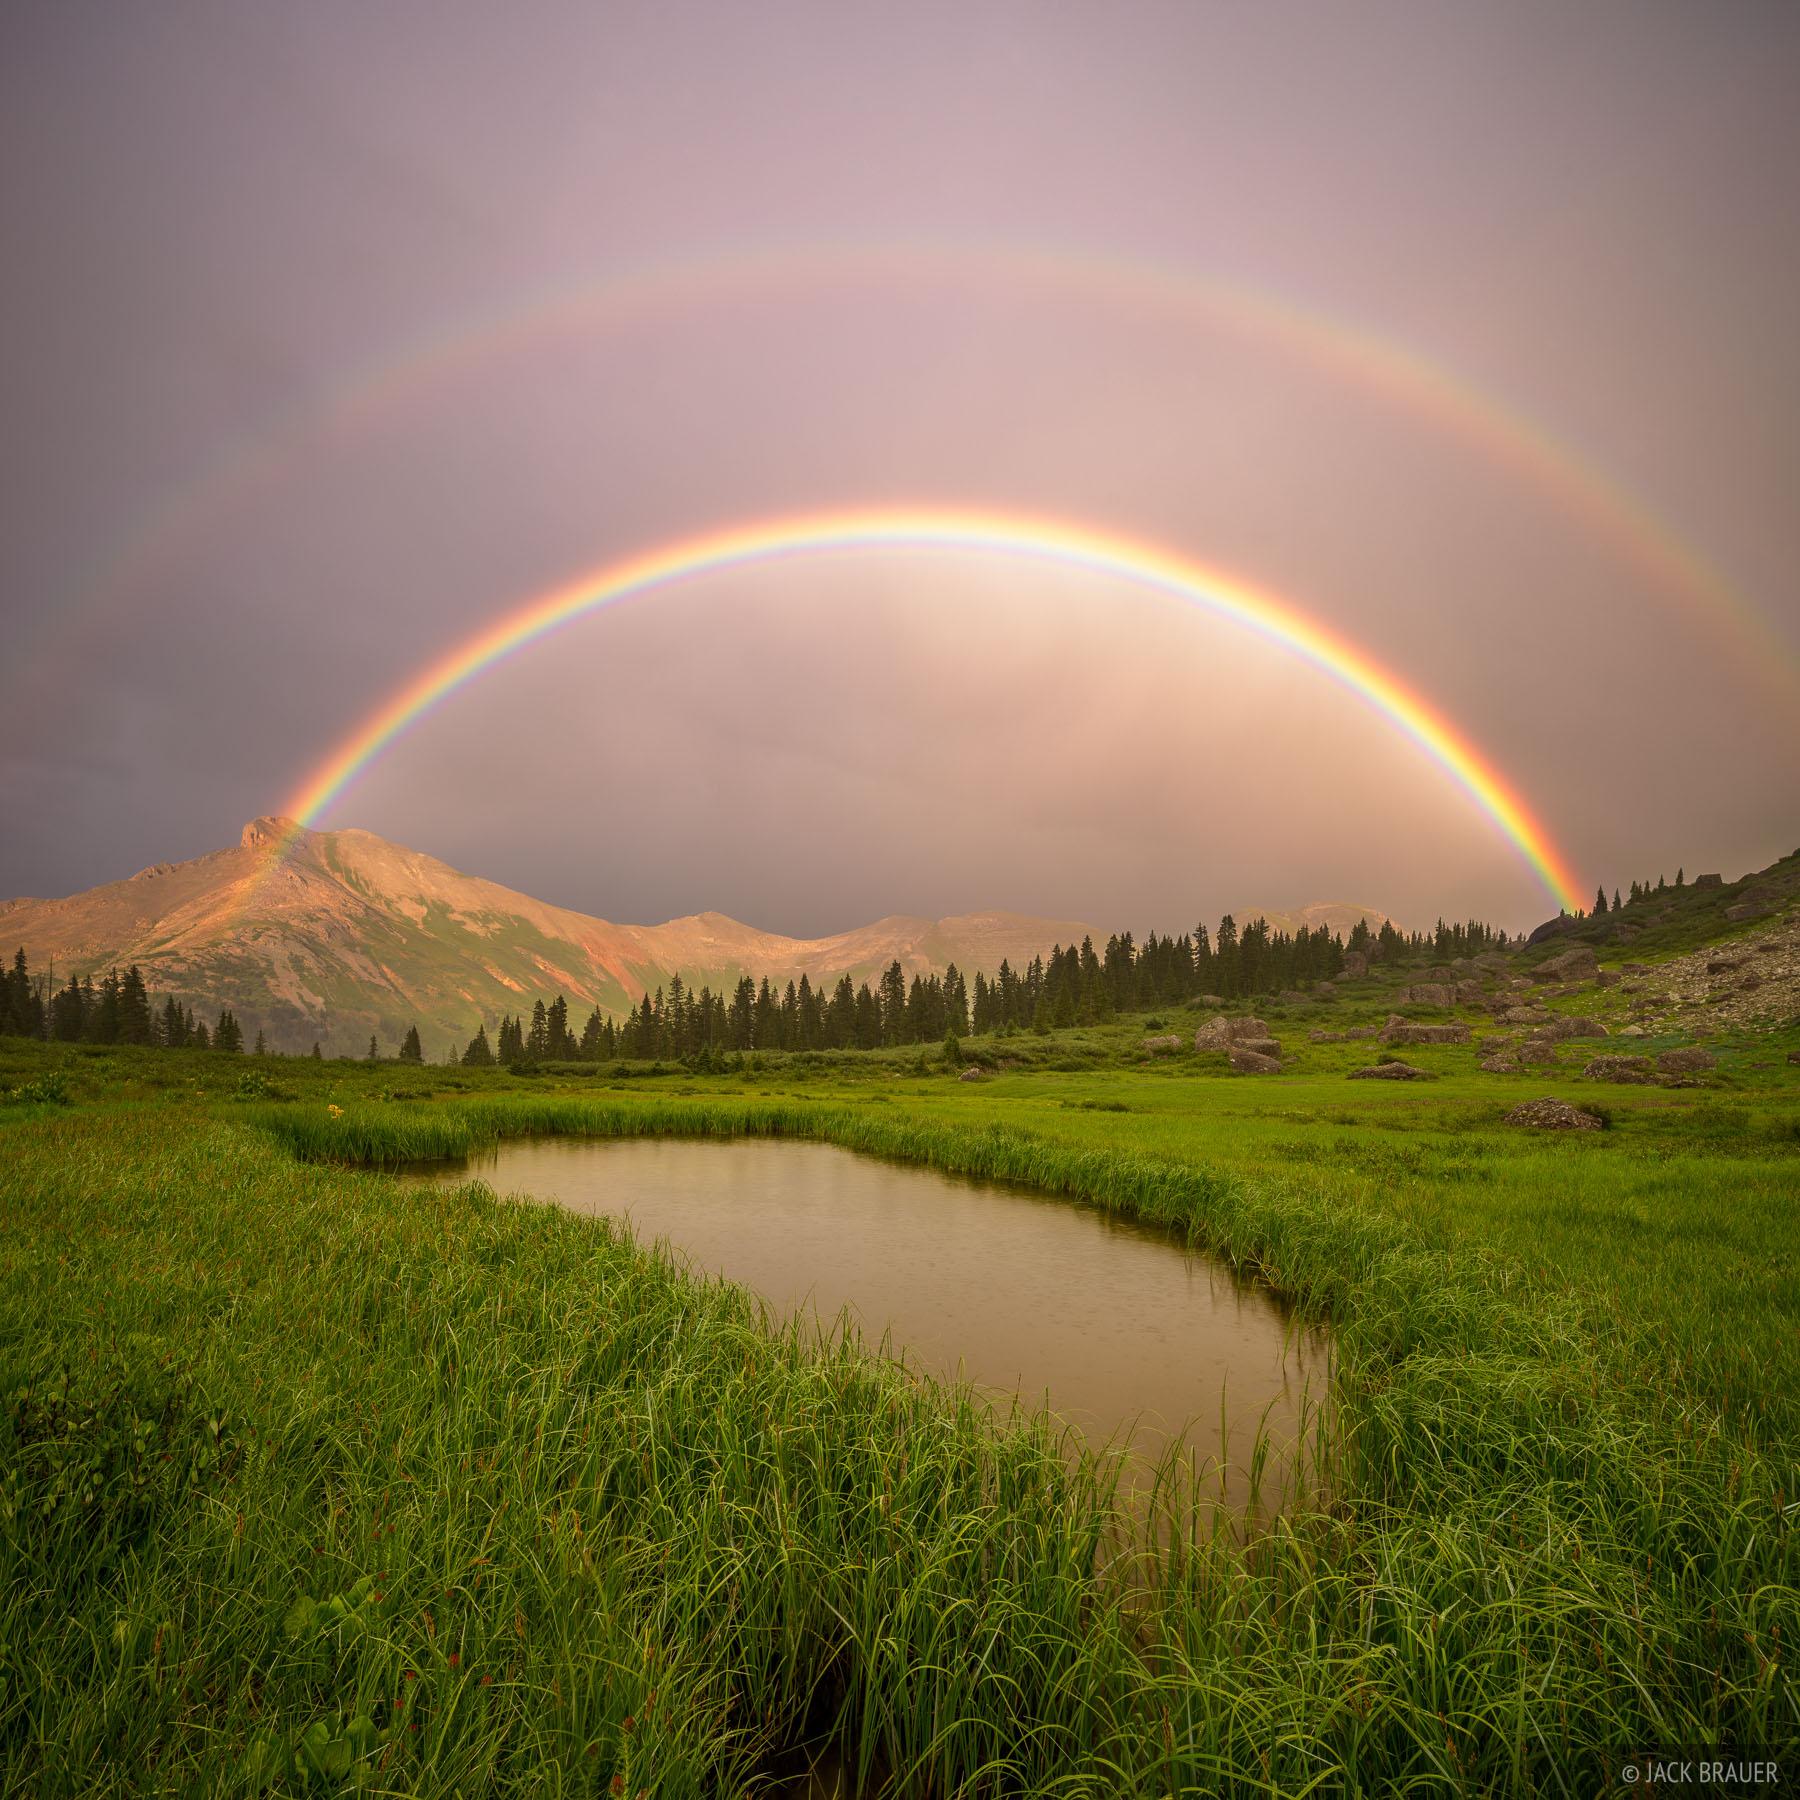 Colorado,San Juan Mountains,Sultan Mountain,rainbow, photo